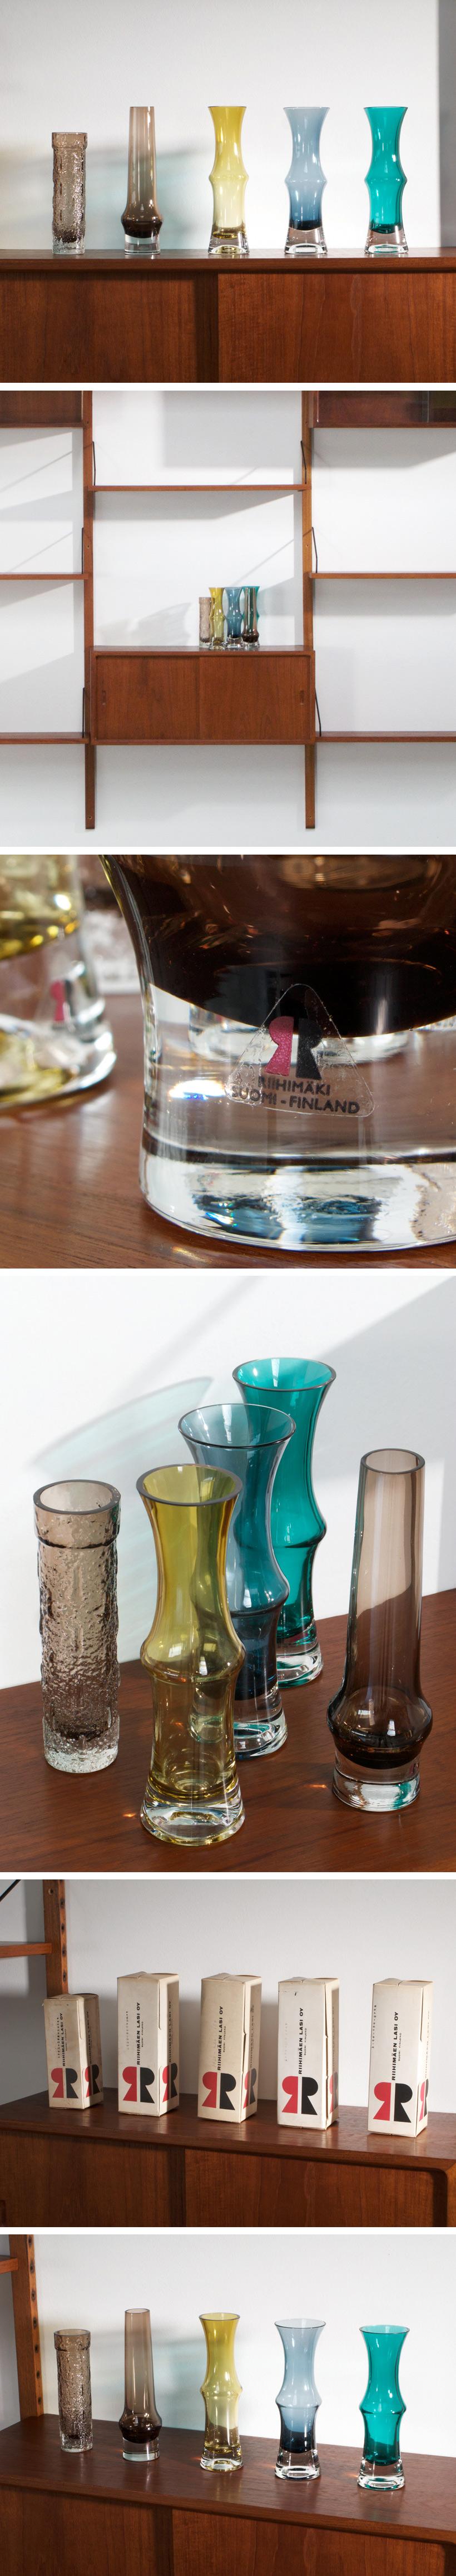 Riihimaen Riihimaki Lasi Oy 5 glass works Tamara Aladin Large